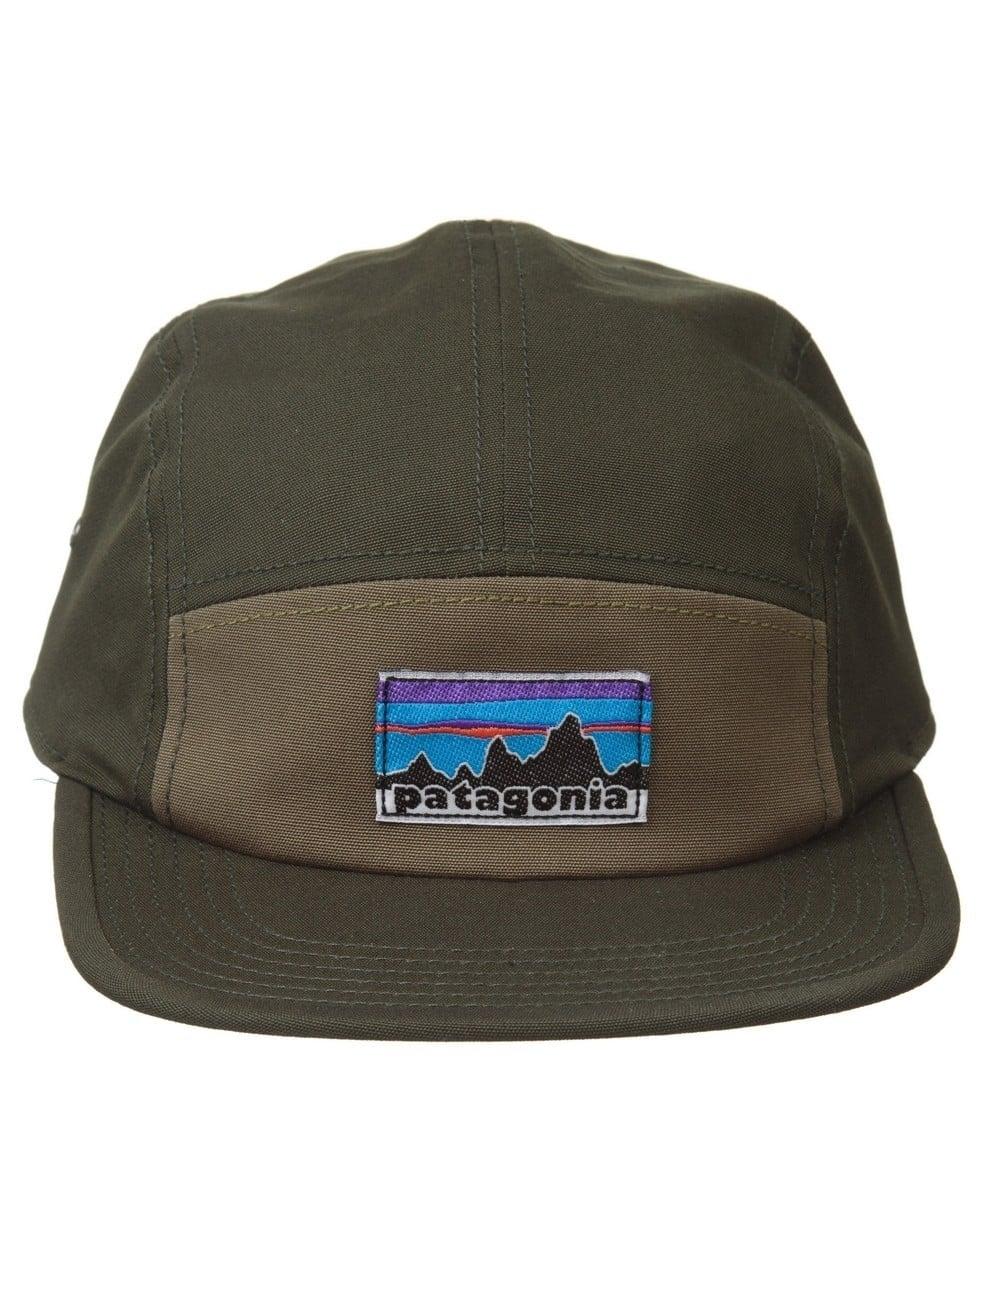 Patagonia Retro Fitz Roy Label Tradesmith Cap - Fatigue Green ... 09f8c422346